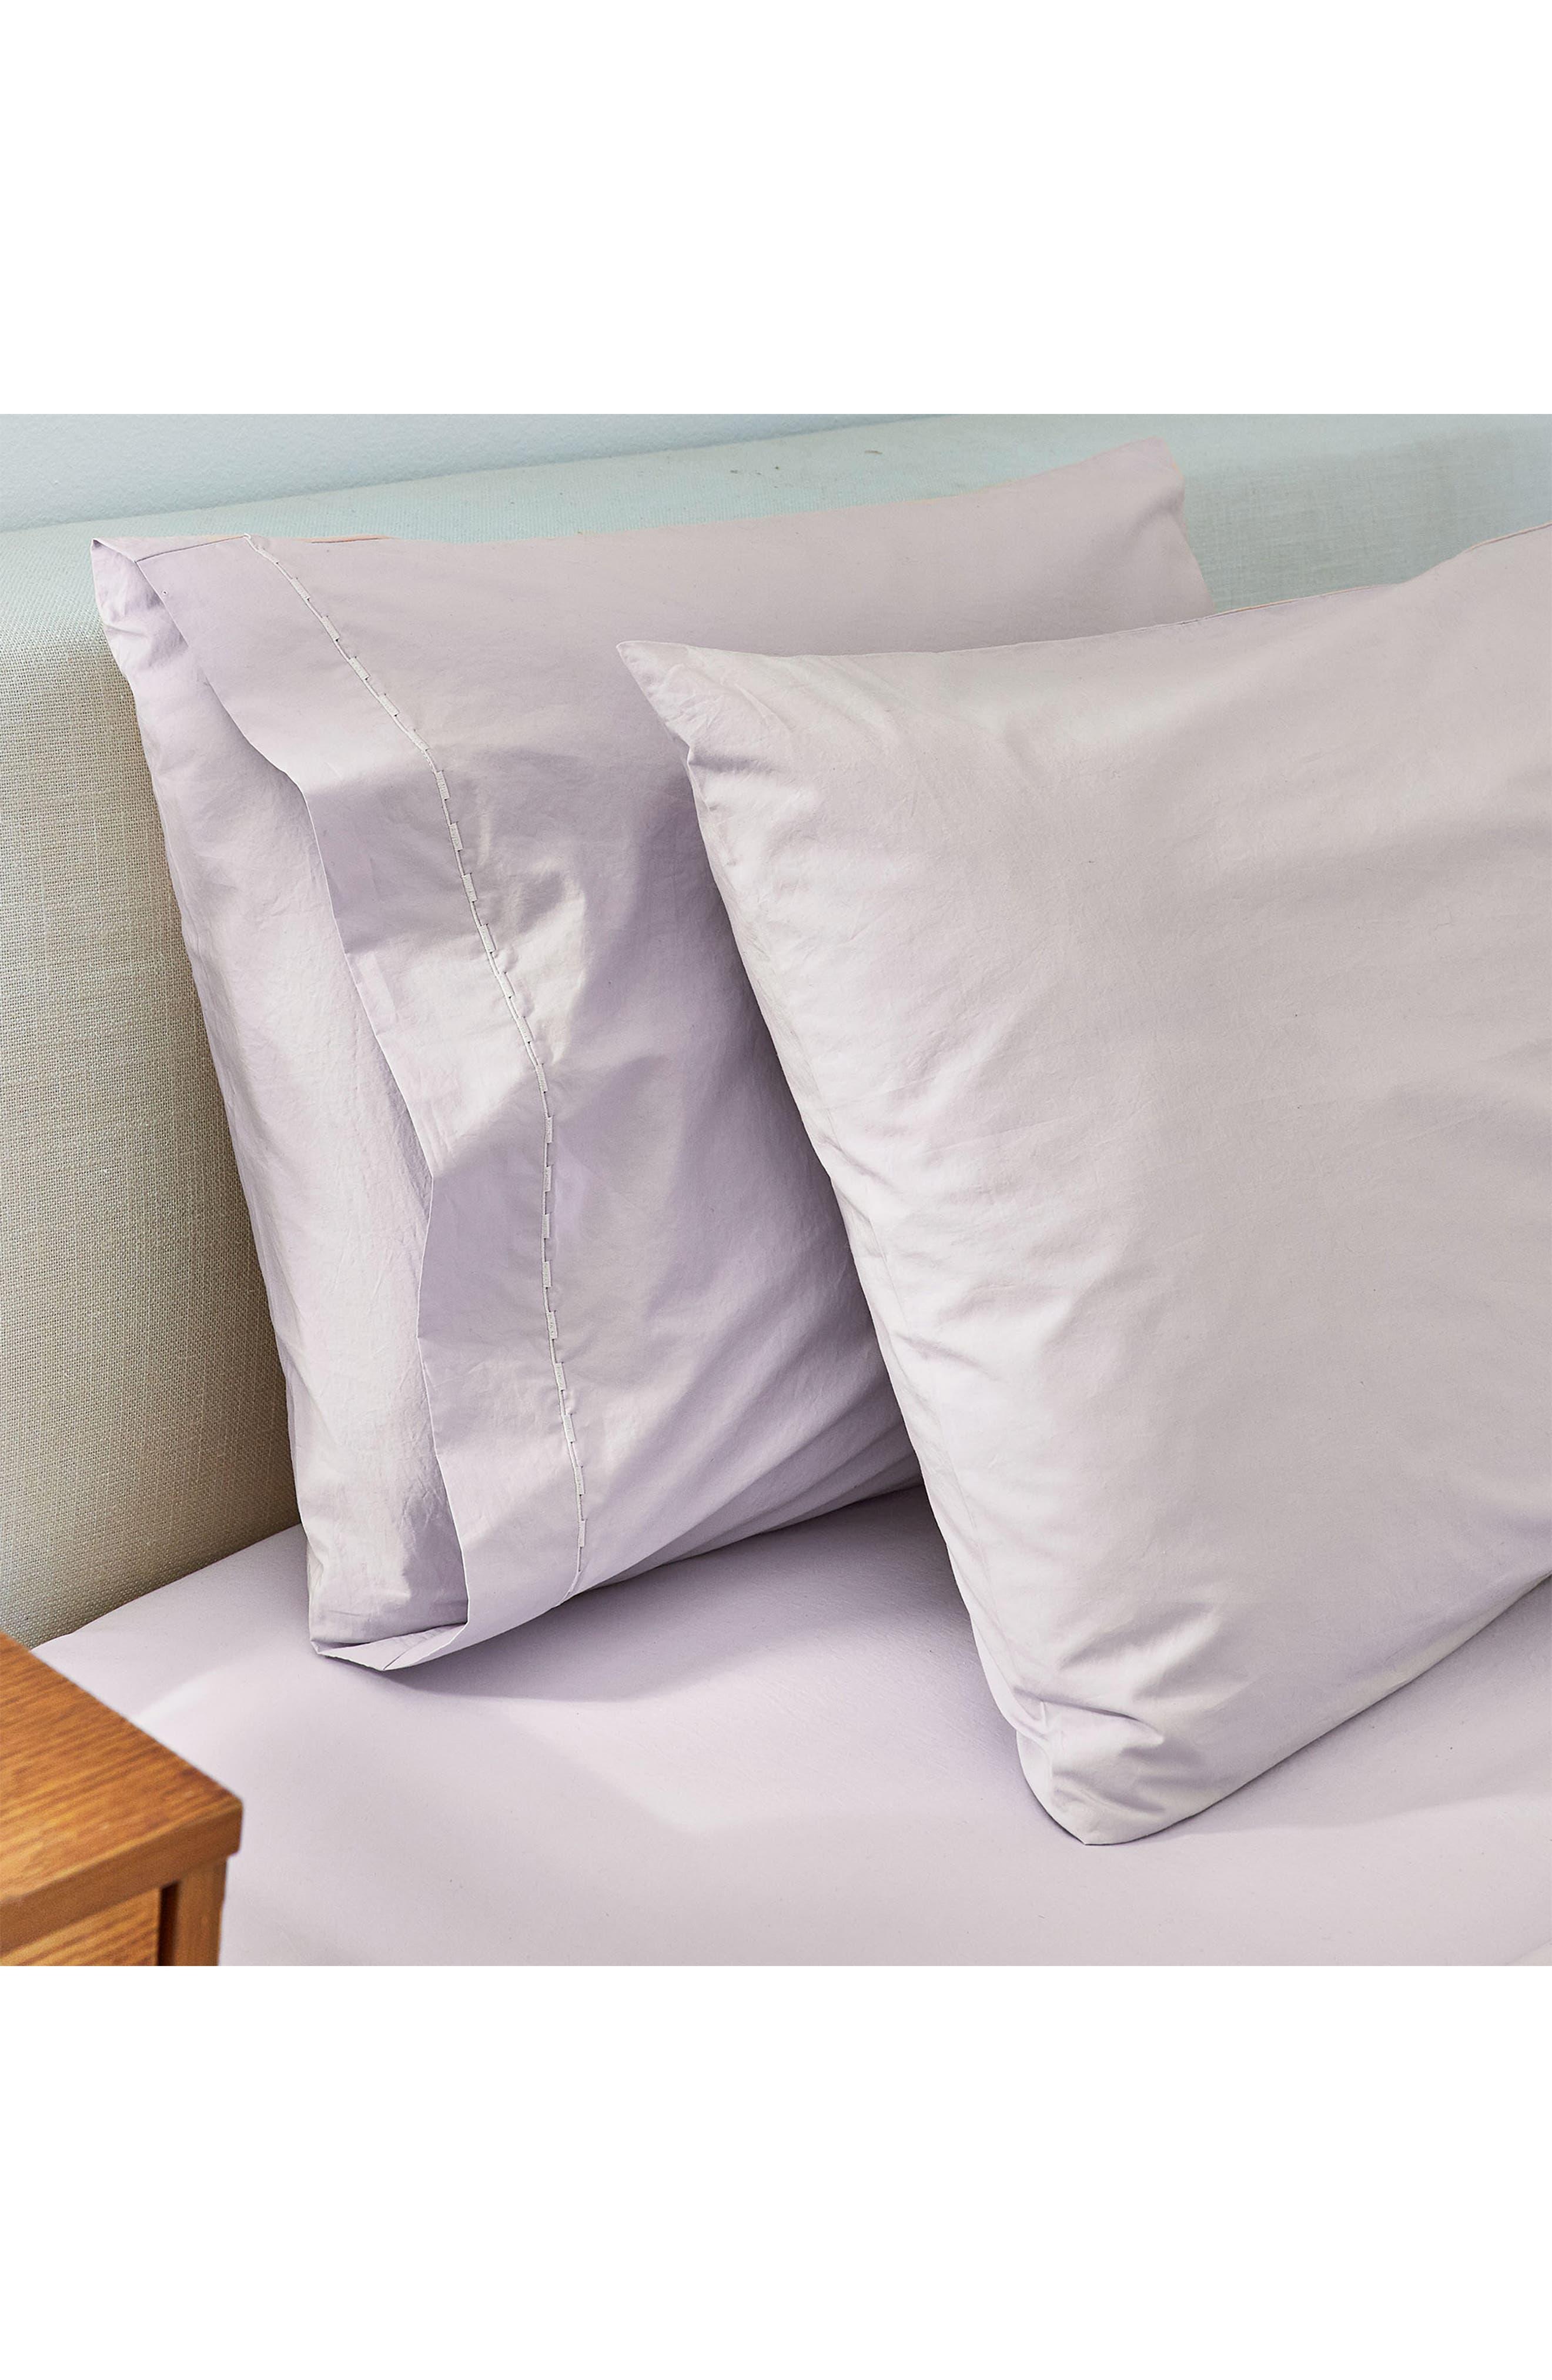 SPLENDID HOME DECOR Spendid Home Decor Cotton Percale Pillowcases, Main, color, MIST